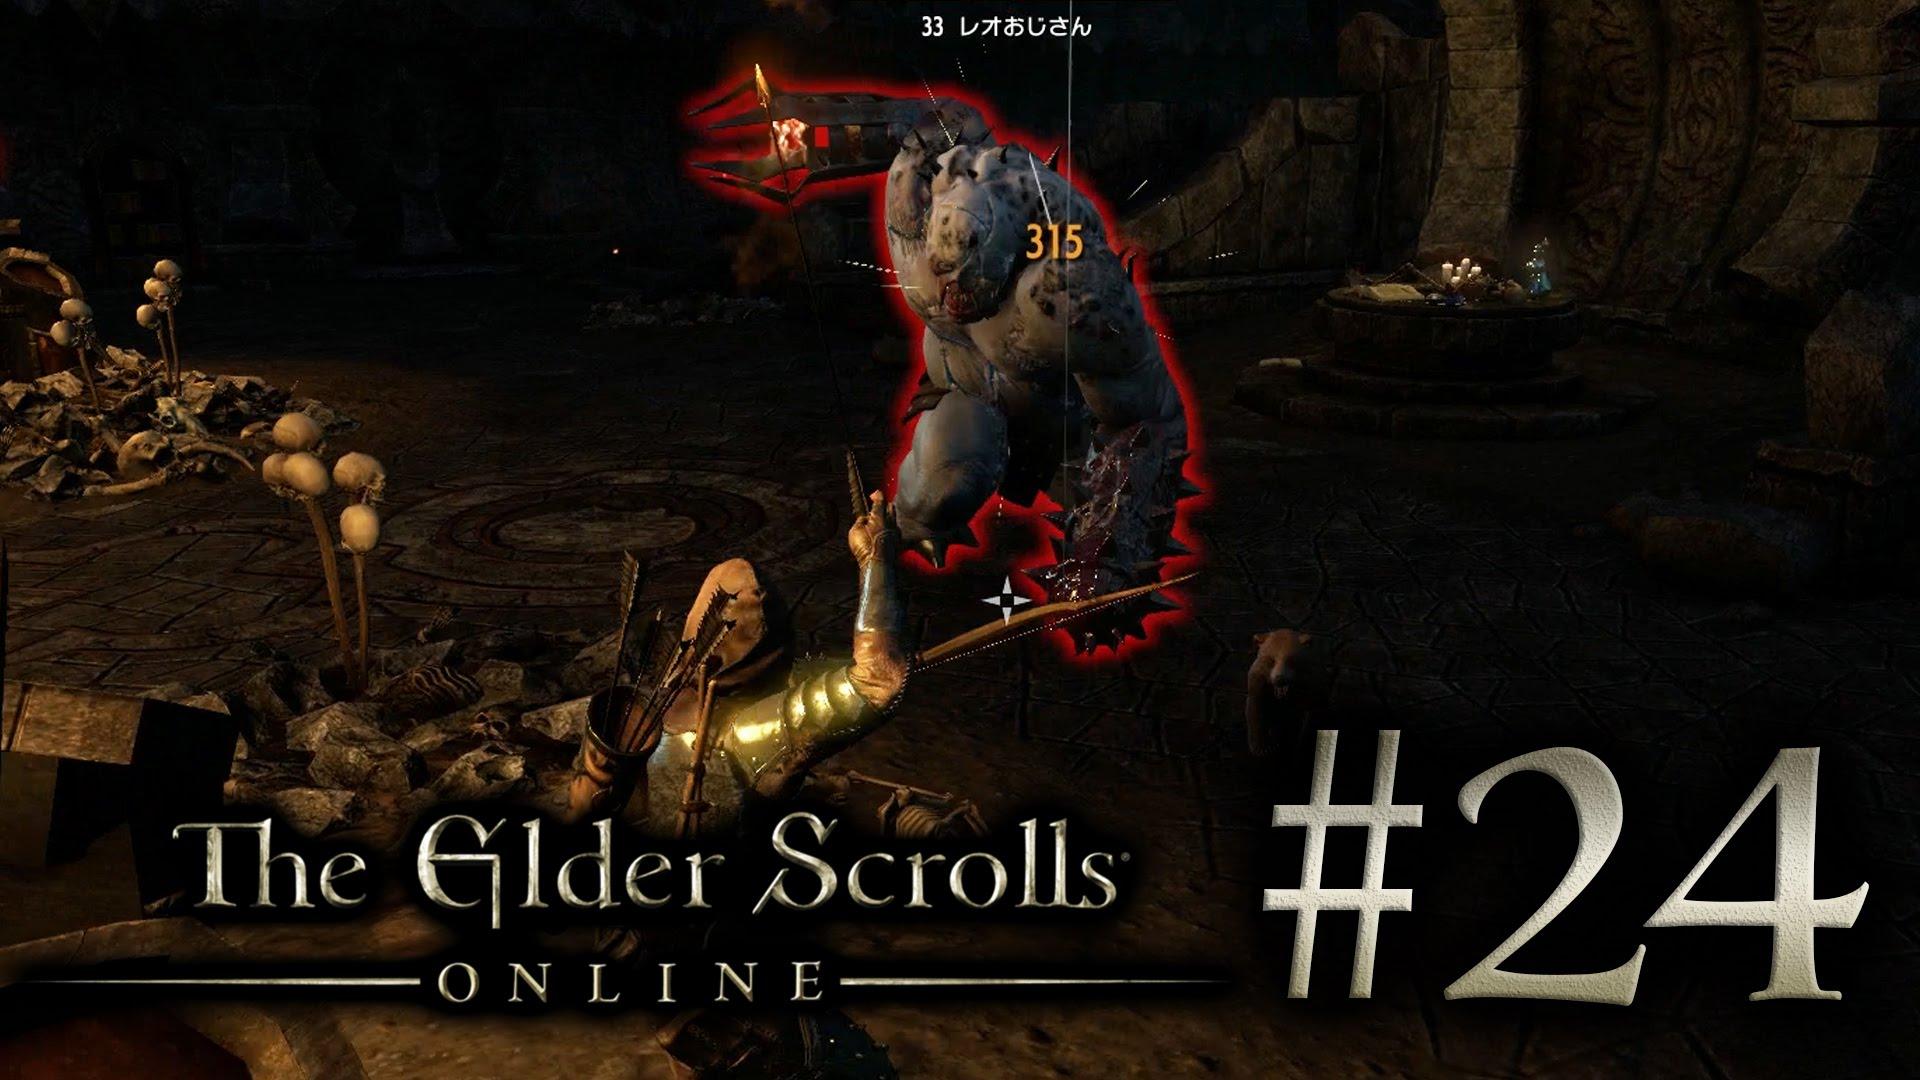 #24 The Elder Scrolls Online [エルダー・スクロールズ・オンライン]